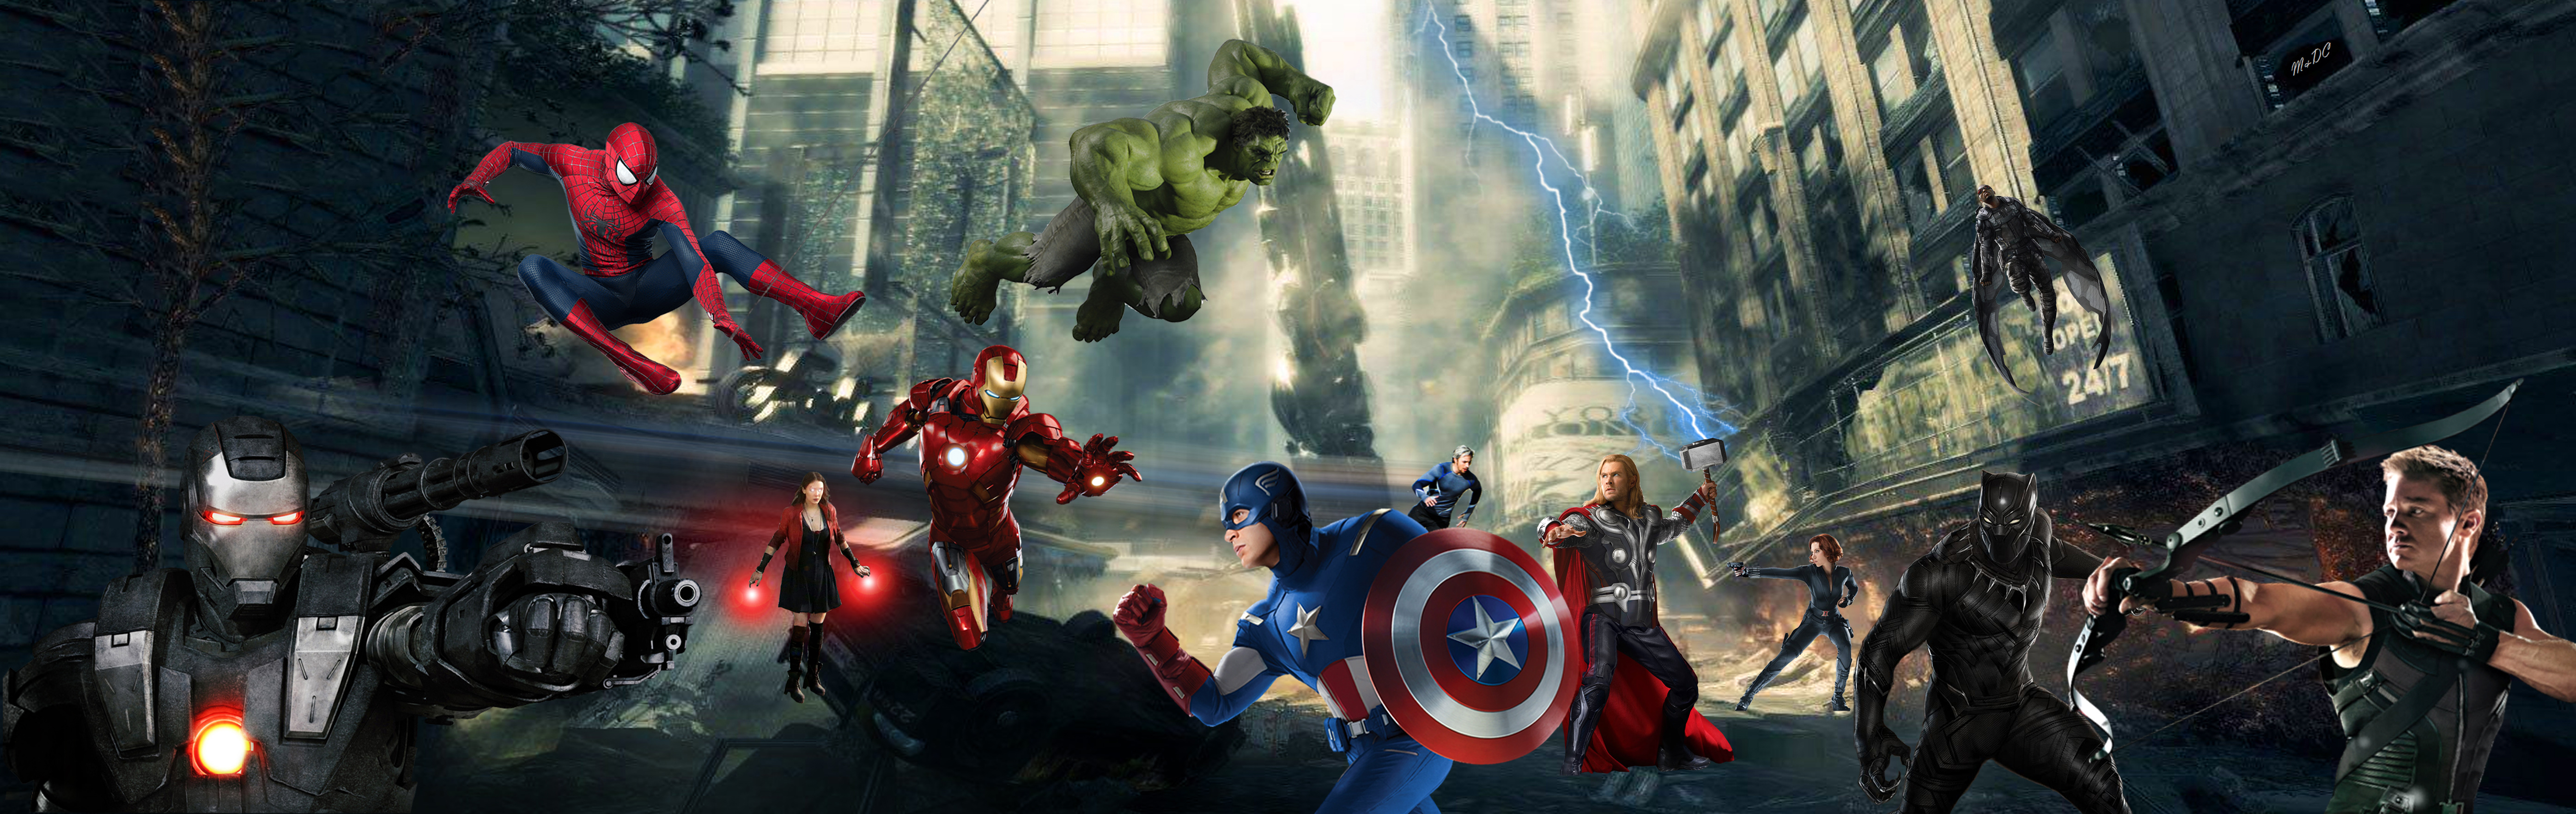 Avengers Assemble Artwork 4k Hd Superheroes 4k Wallpapers Images